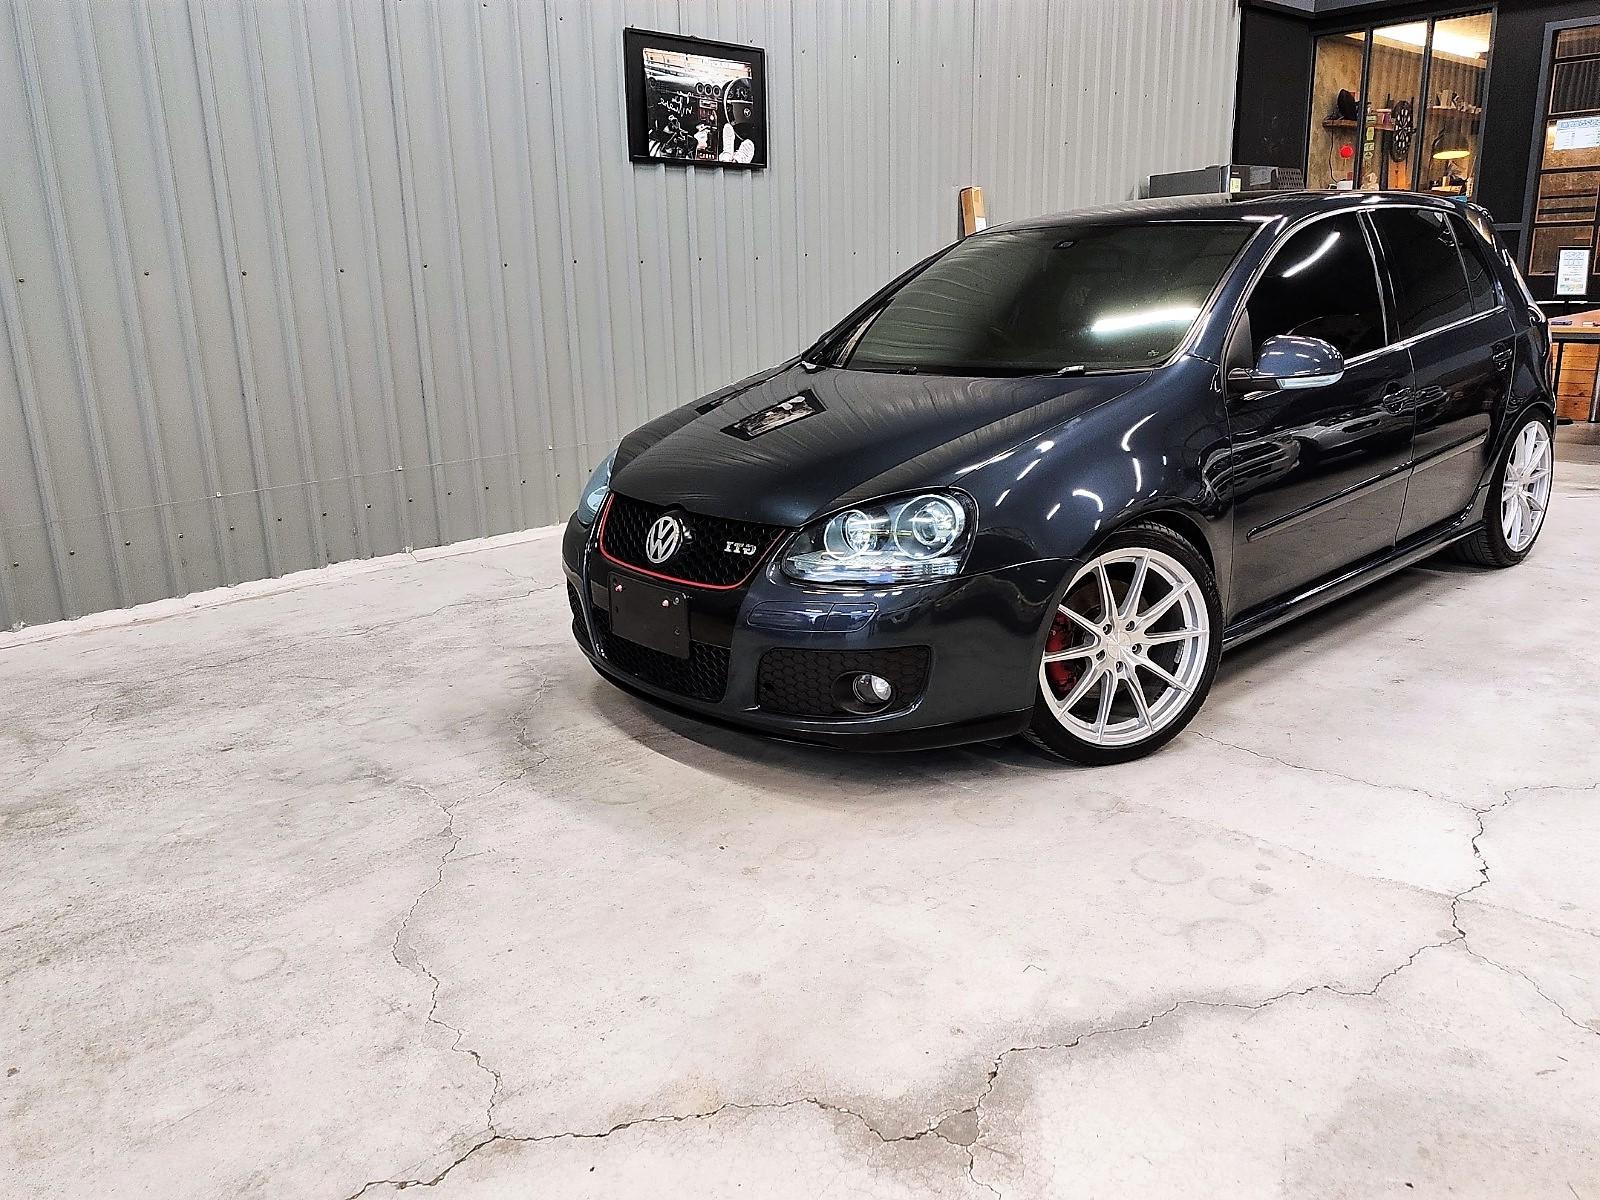 2009 Volkswagen 福斯 Golf gti